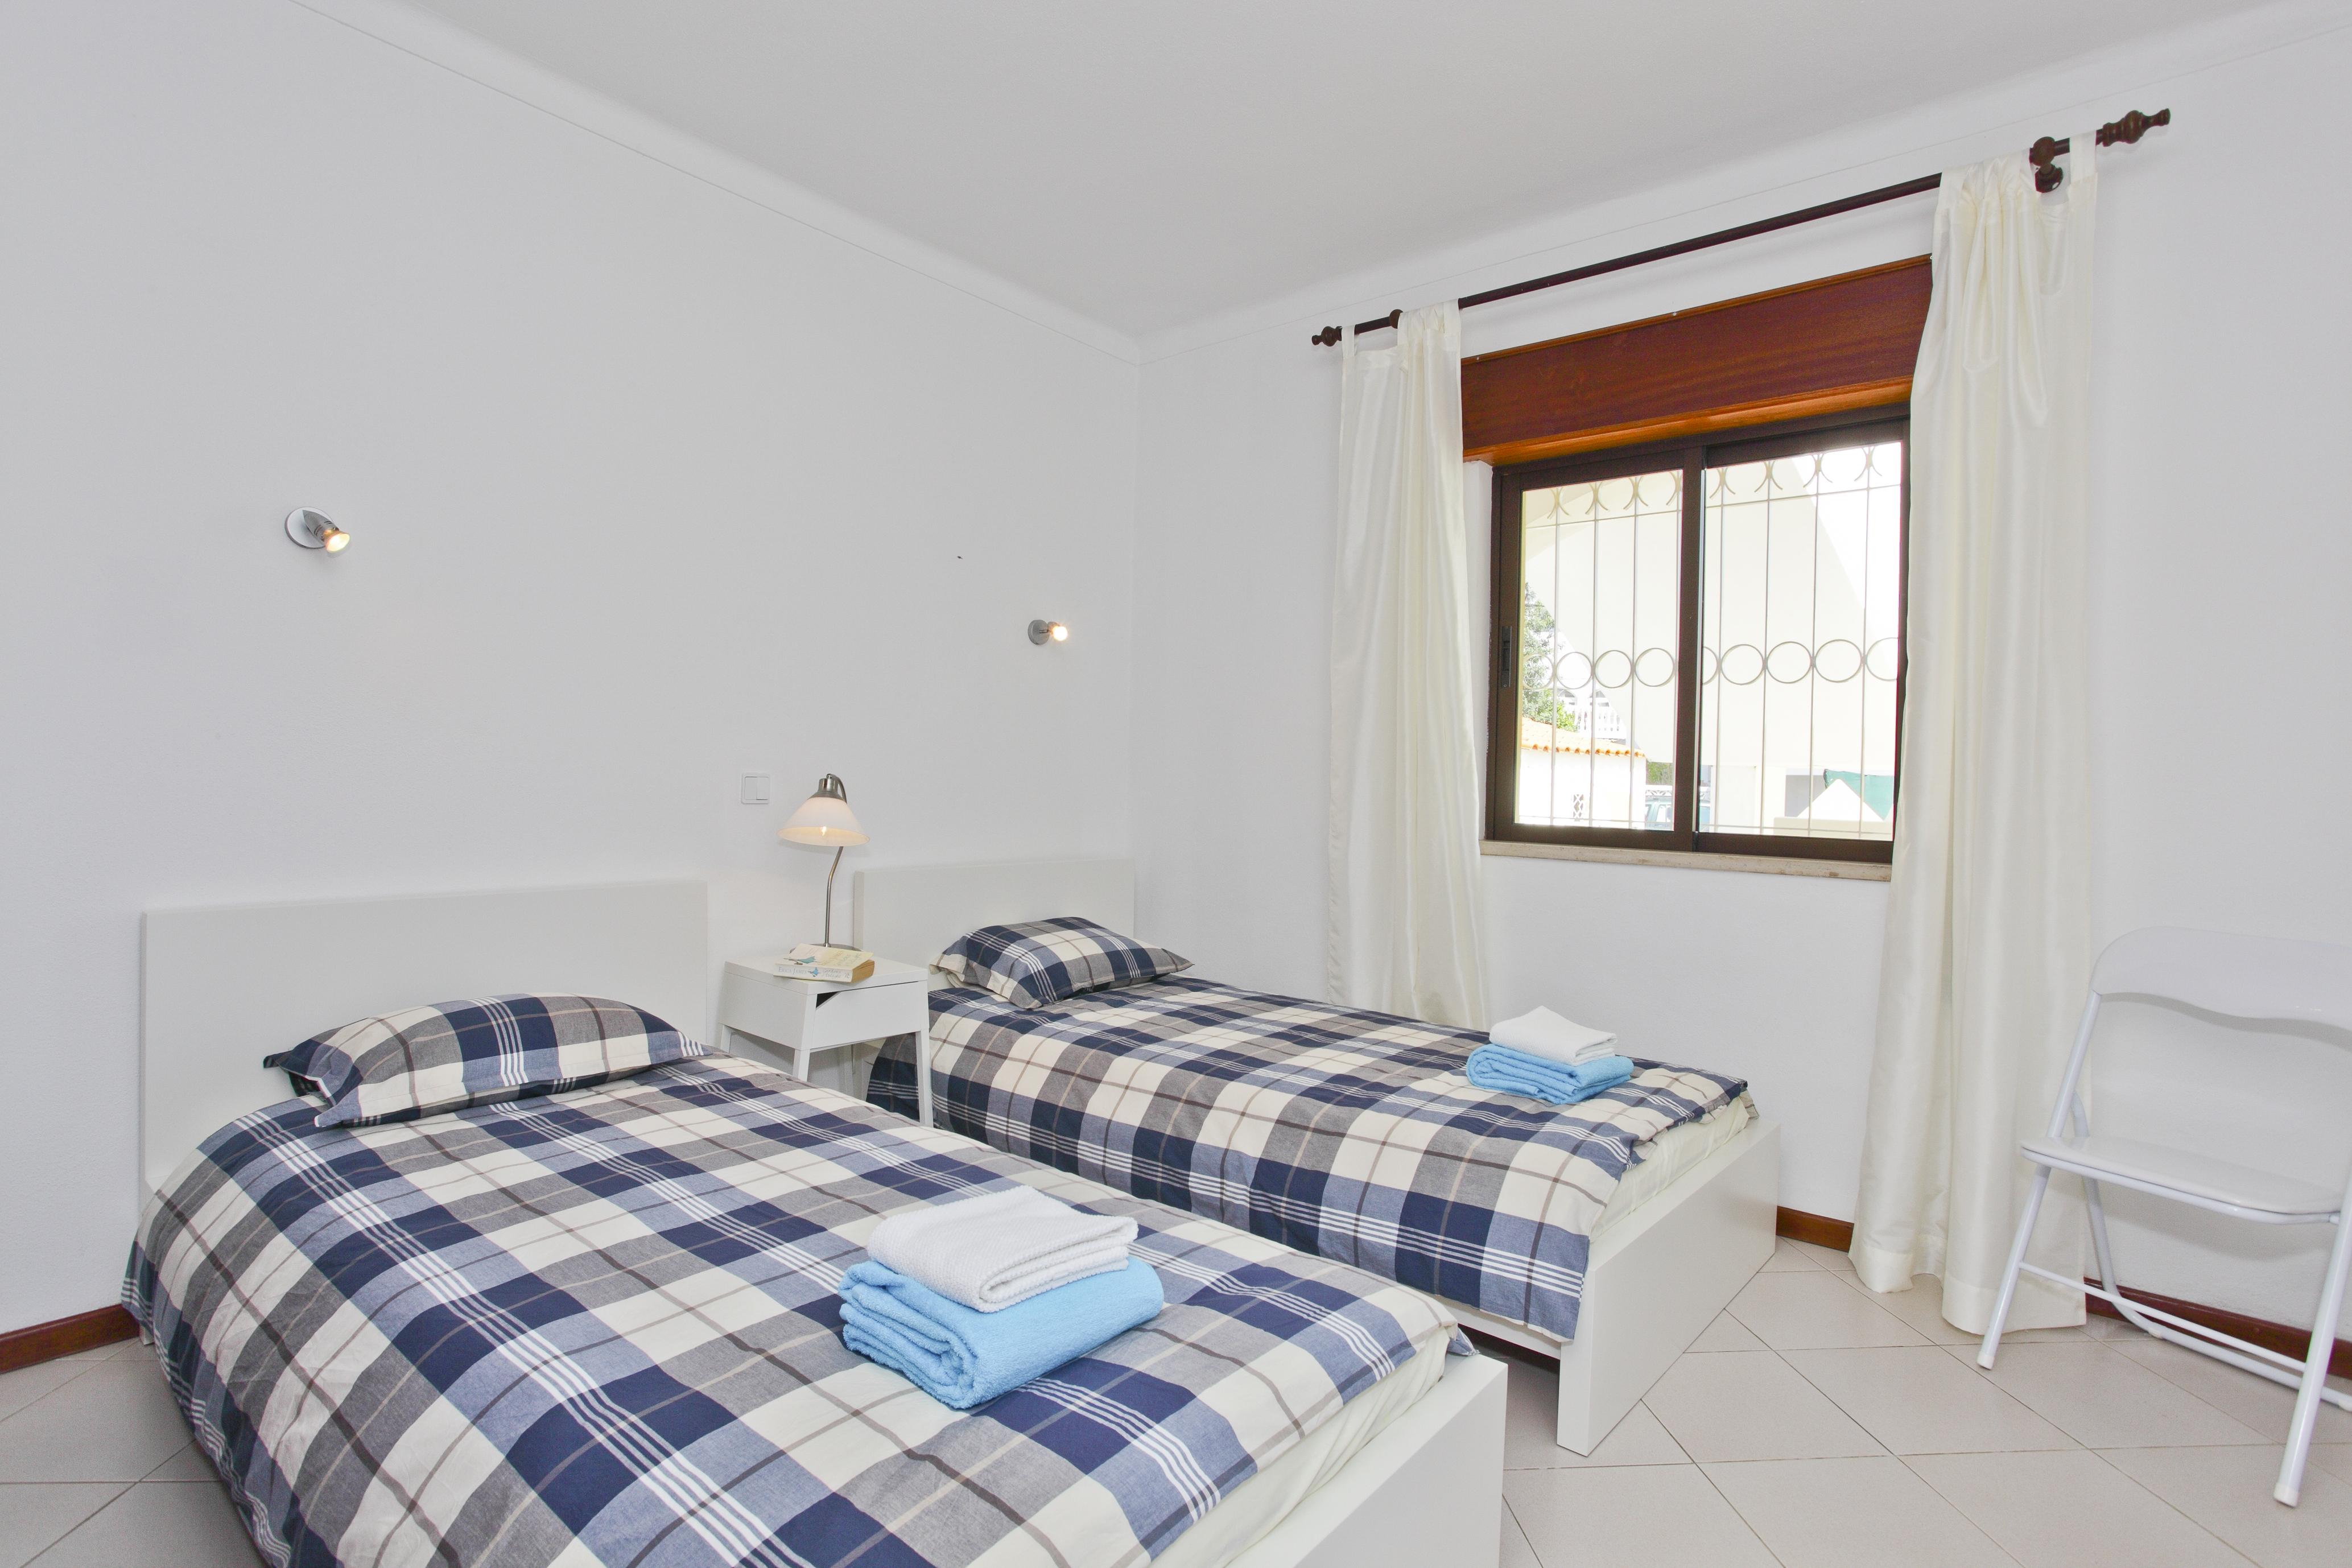 Holiday apartments and villas for rent, 2 Algarve Carvoeiro Apartments, sleeps 5 in Carvoeiro, Portugal Algarve, REF_IMG_12687_12694